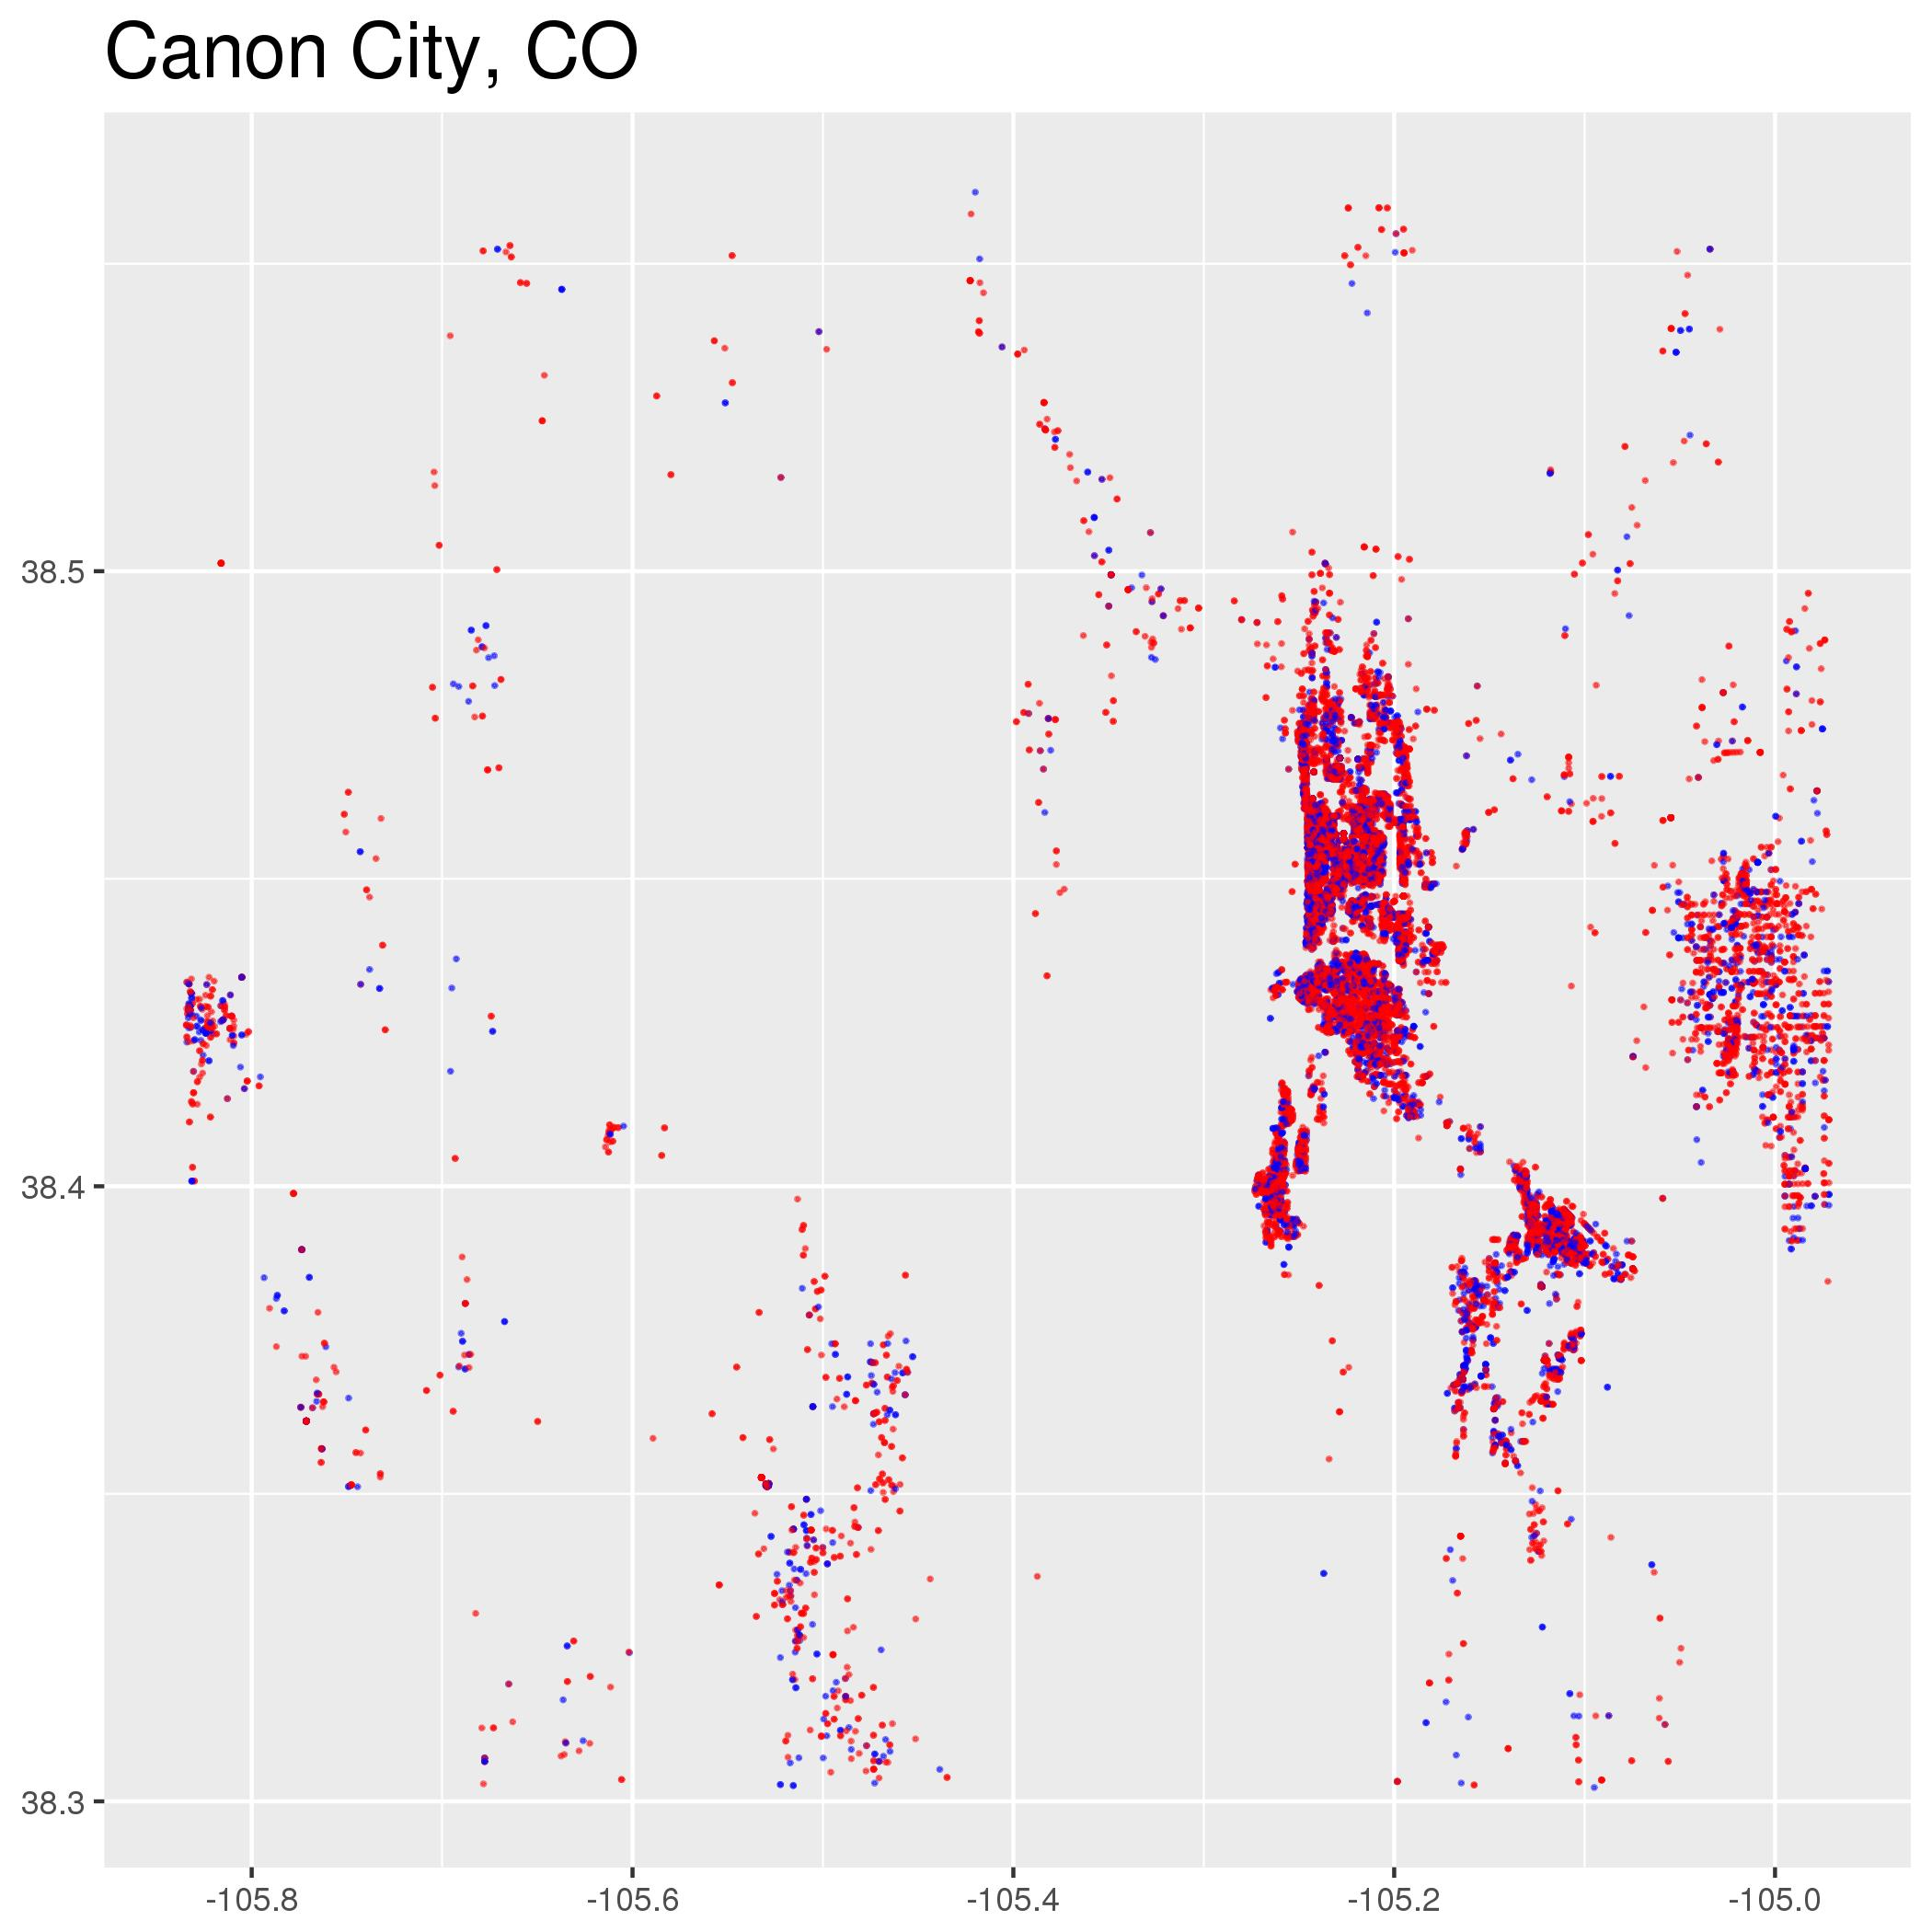 CanonCityCO.jpeg